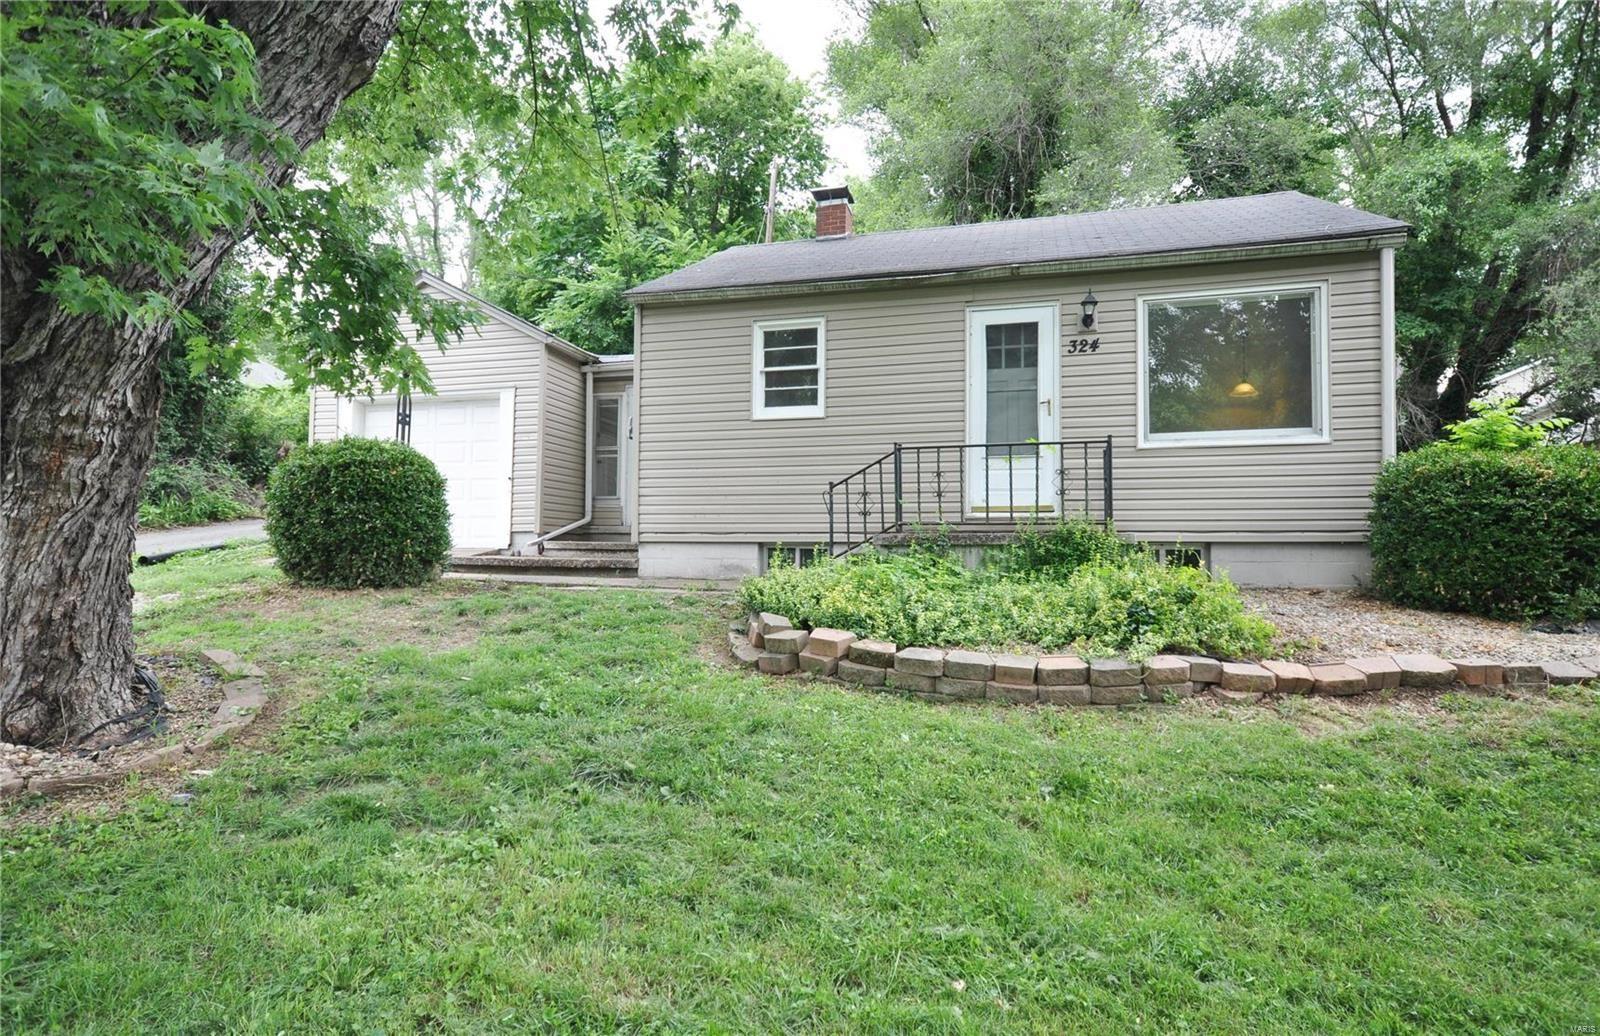 324 Meister Street, Collinsville, IL 62234 - MLS#: 21051073